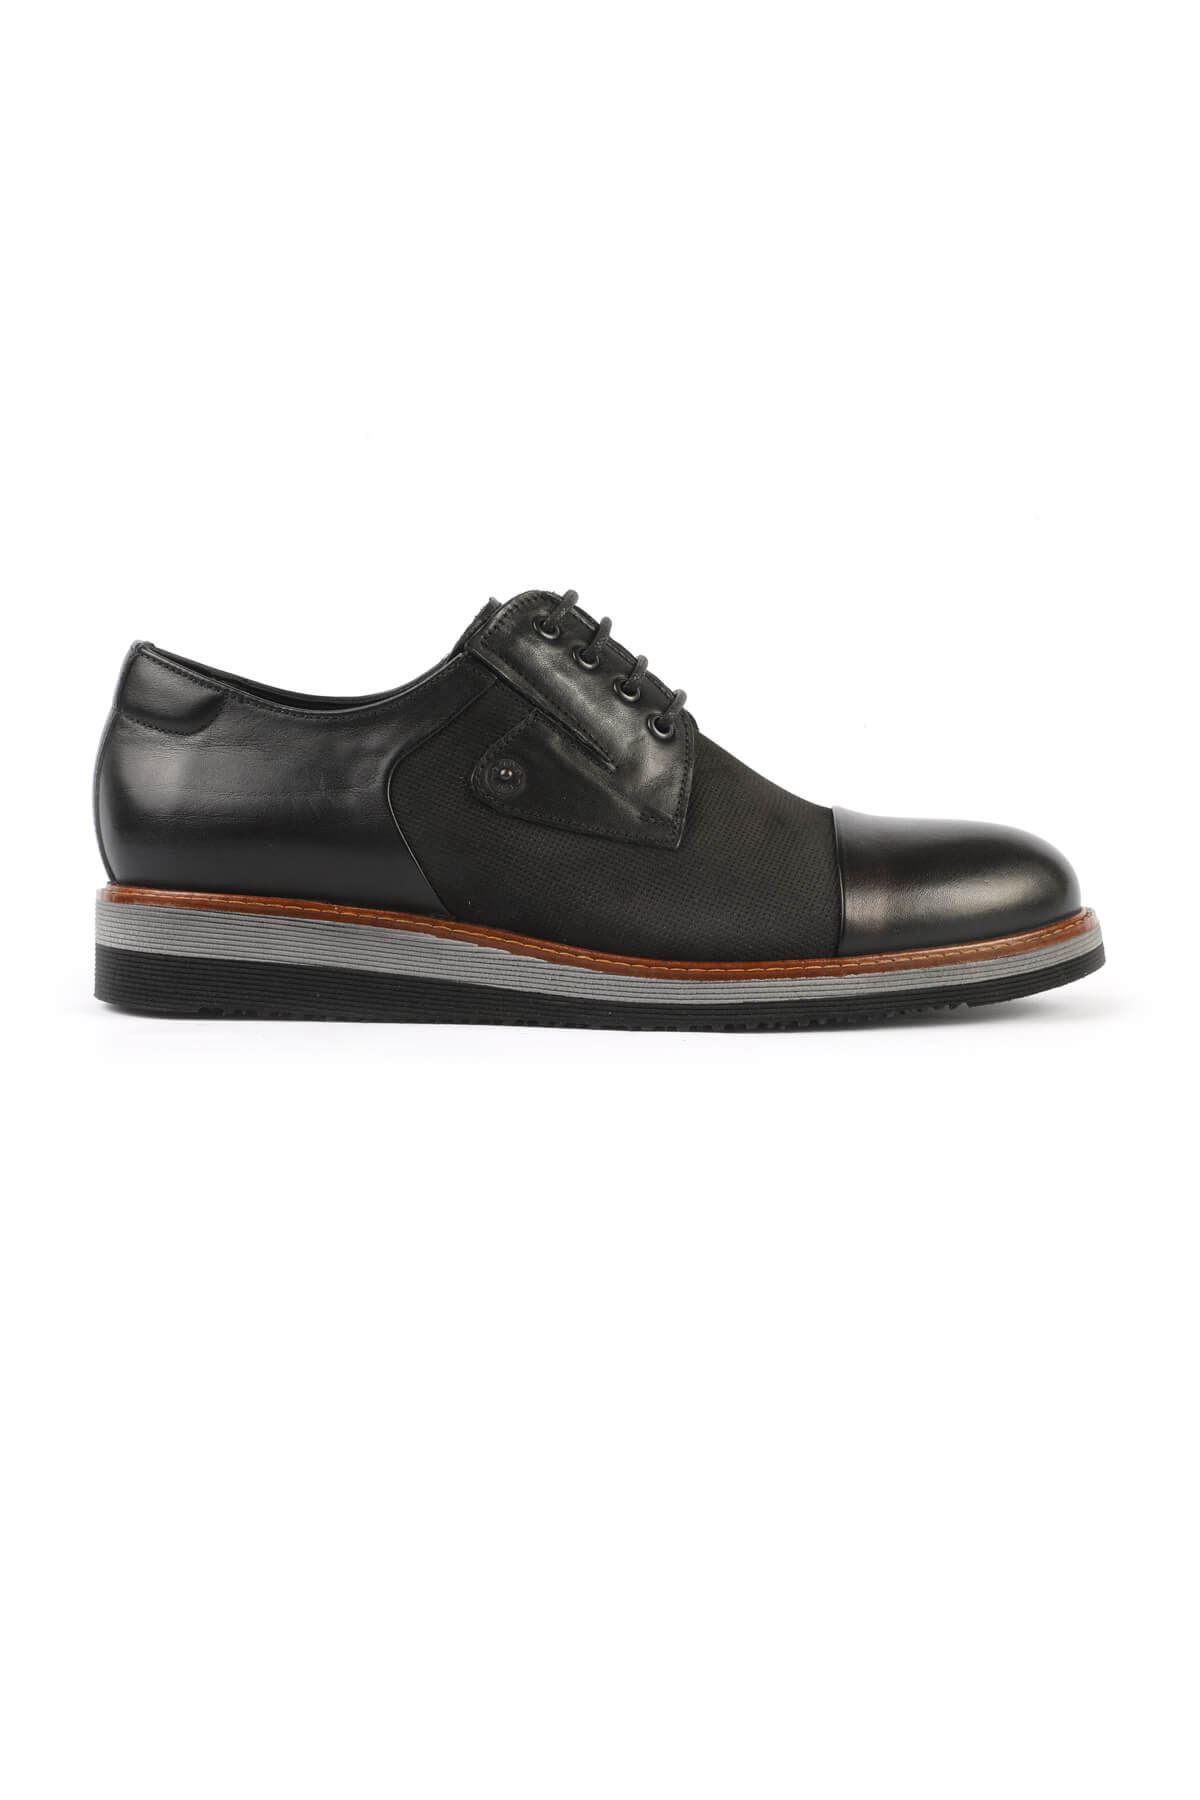 Libero 2641 Black Oxford Shoes